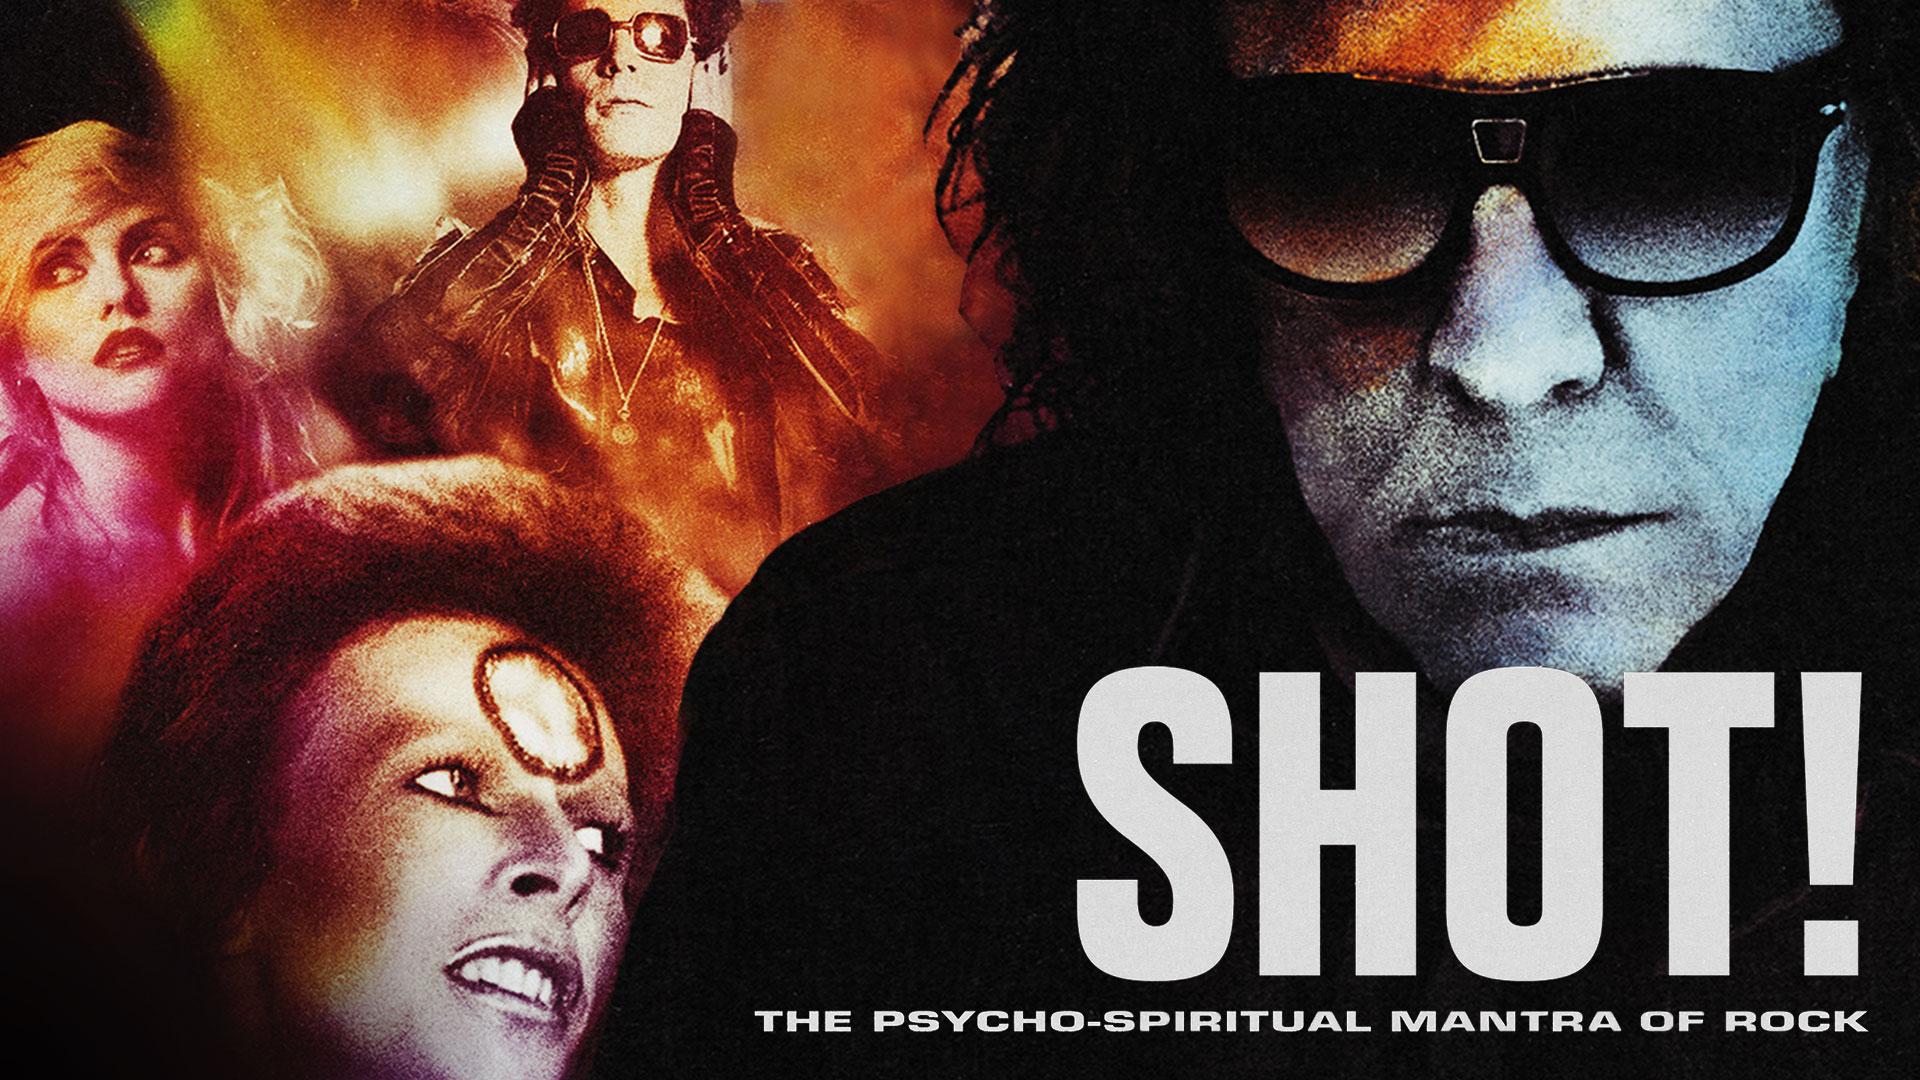 Shot! The Psycho-Spiritual Mantra of Rock